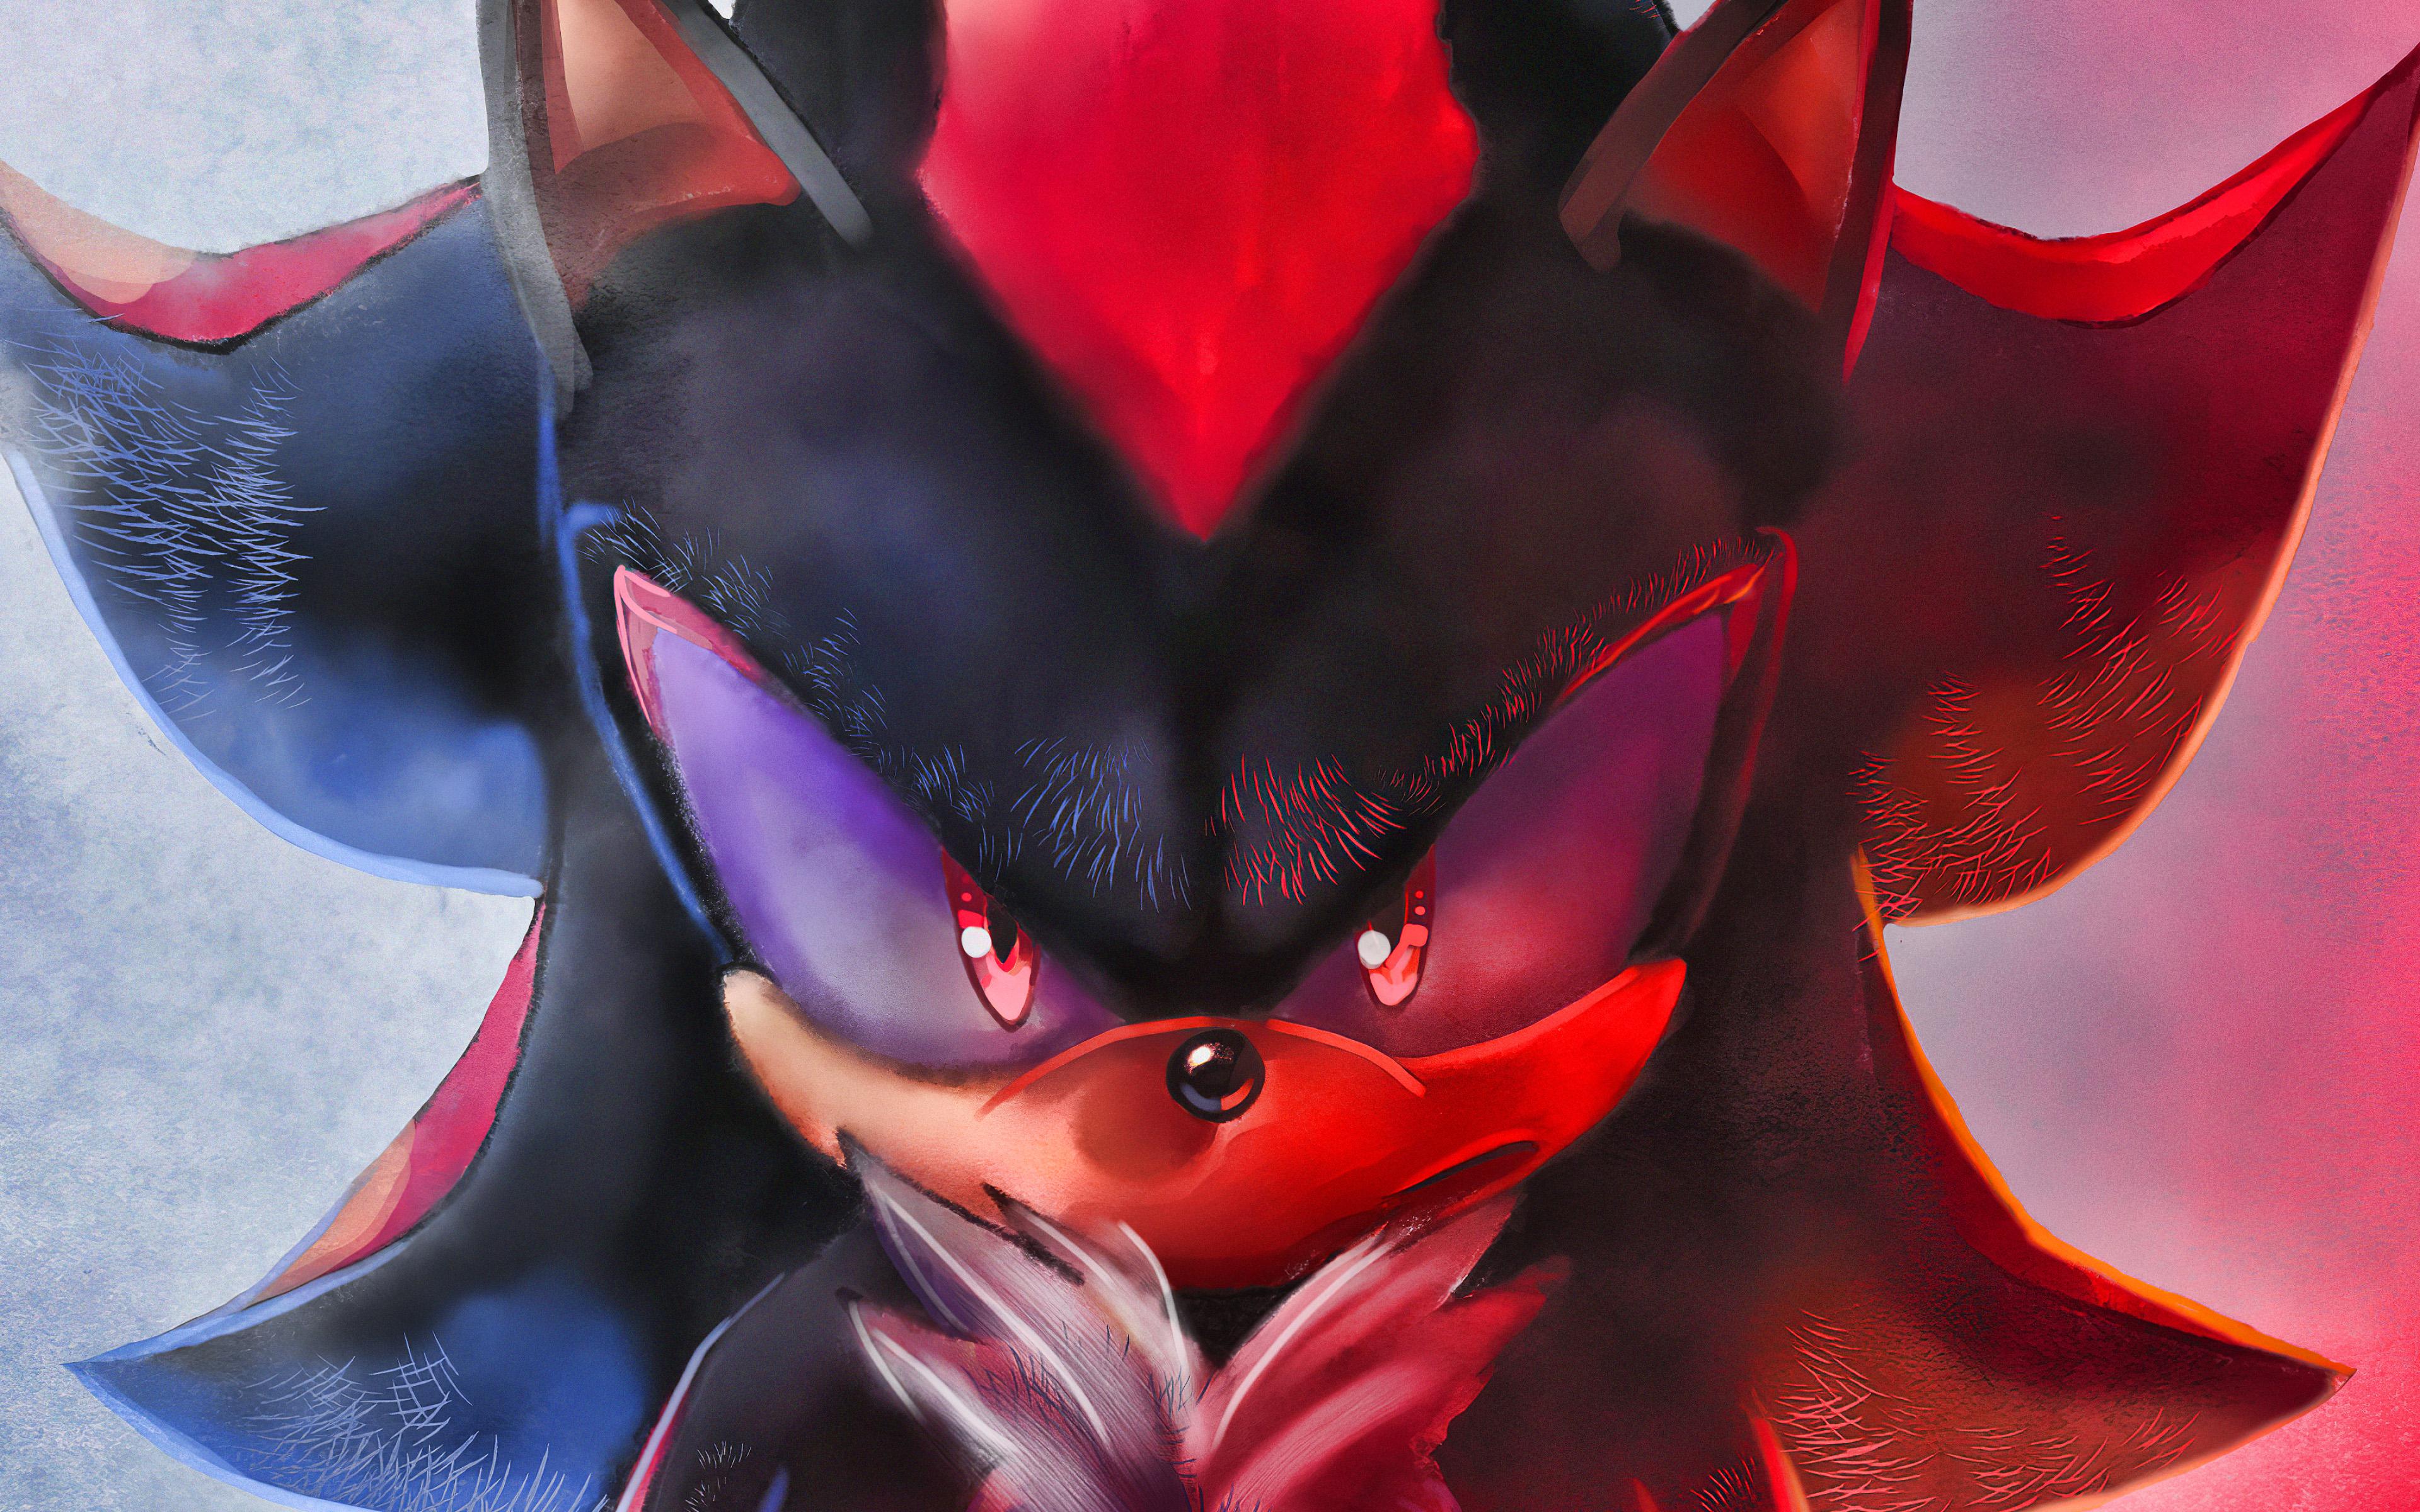 Shadow The Hedgehog 4k Sonic The Hedgehog Poster Sonic The Hedgehog Wallpaper Hd 3134275 Hd Wallpaper Backgrounds Download